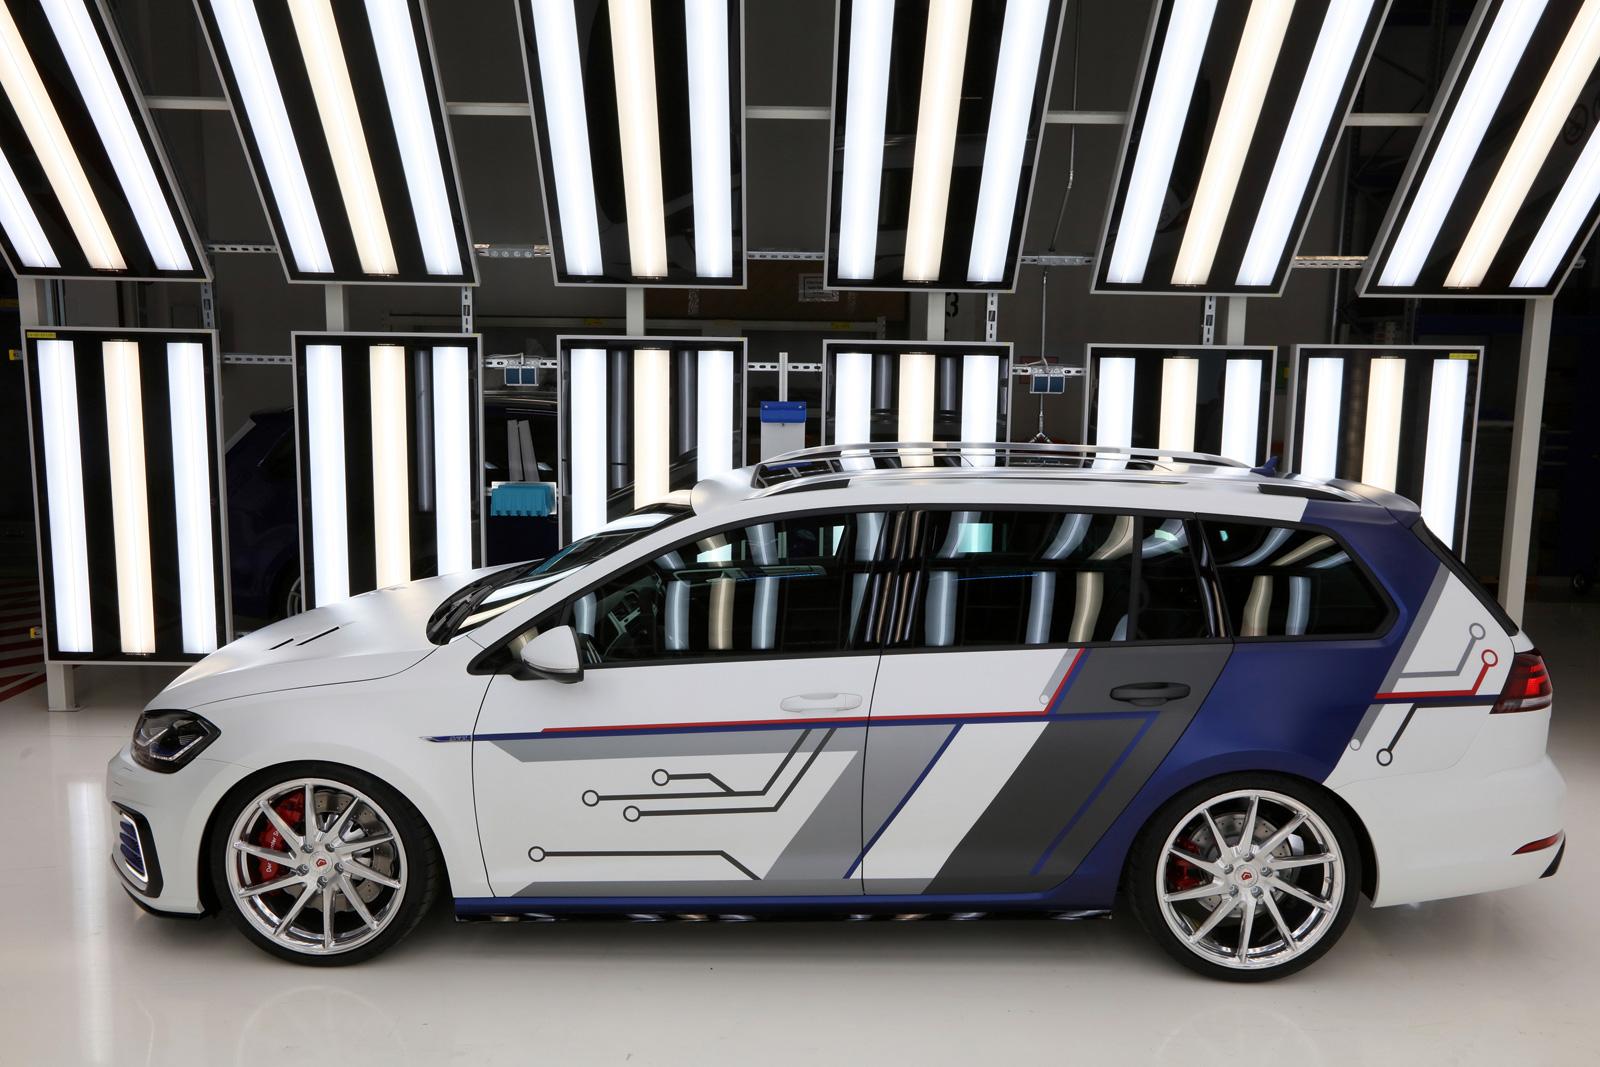 Audi-RS3-lacquererei-ingolstadt-298